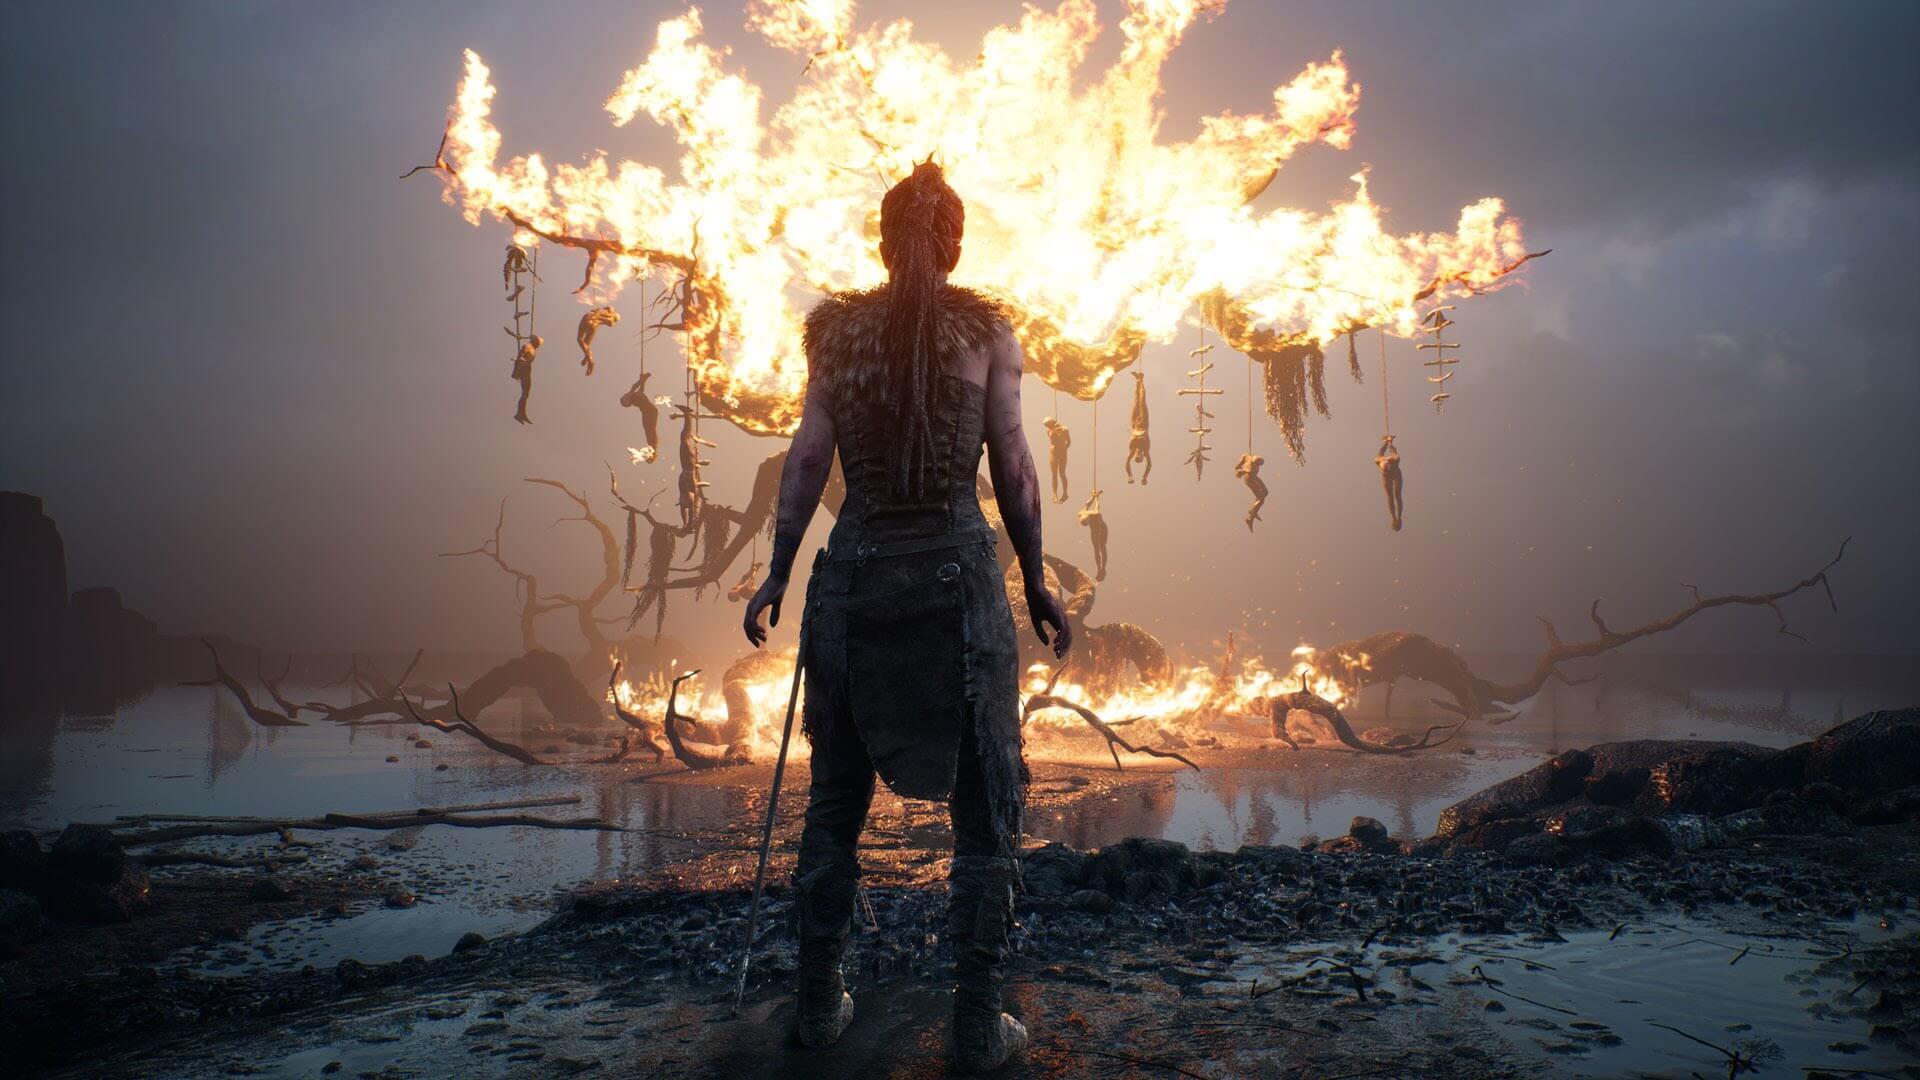 hellblade senua's sacrifice download free